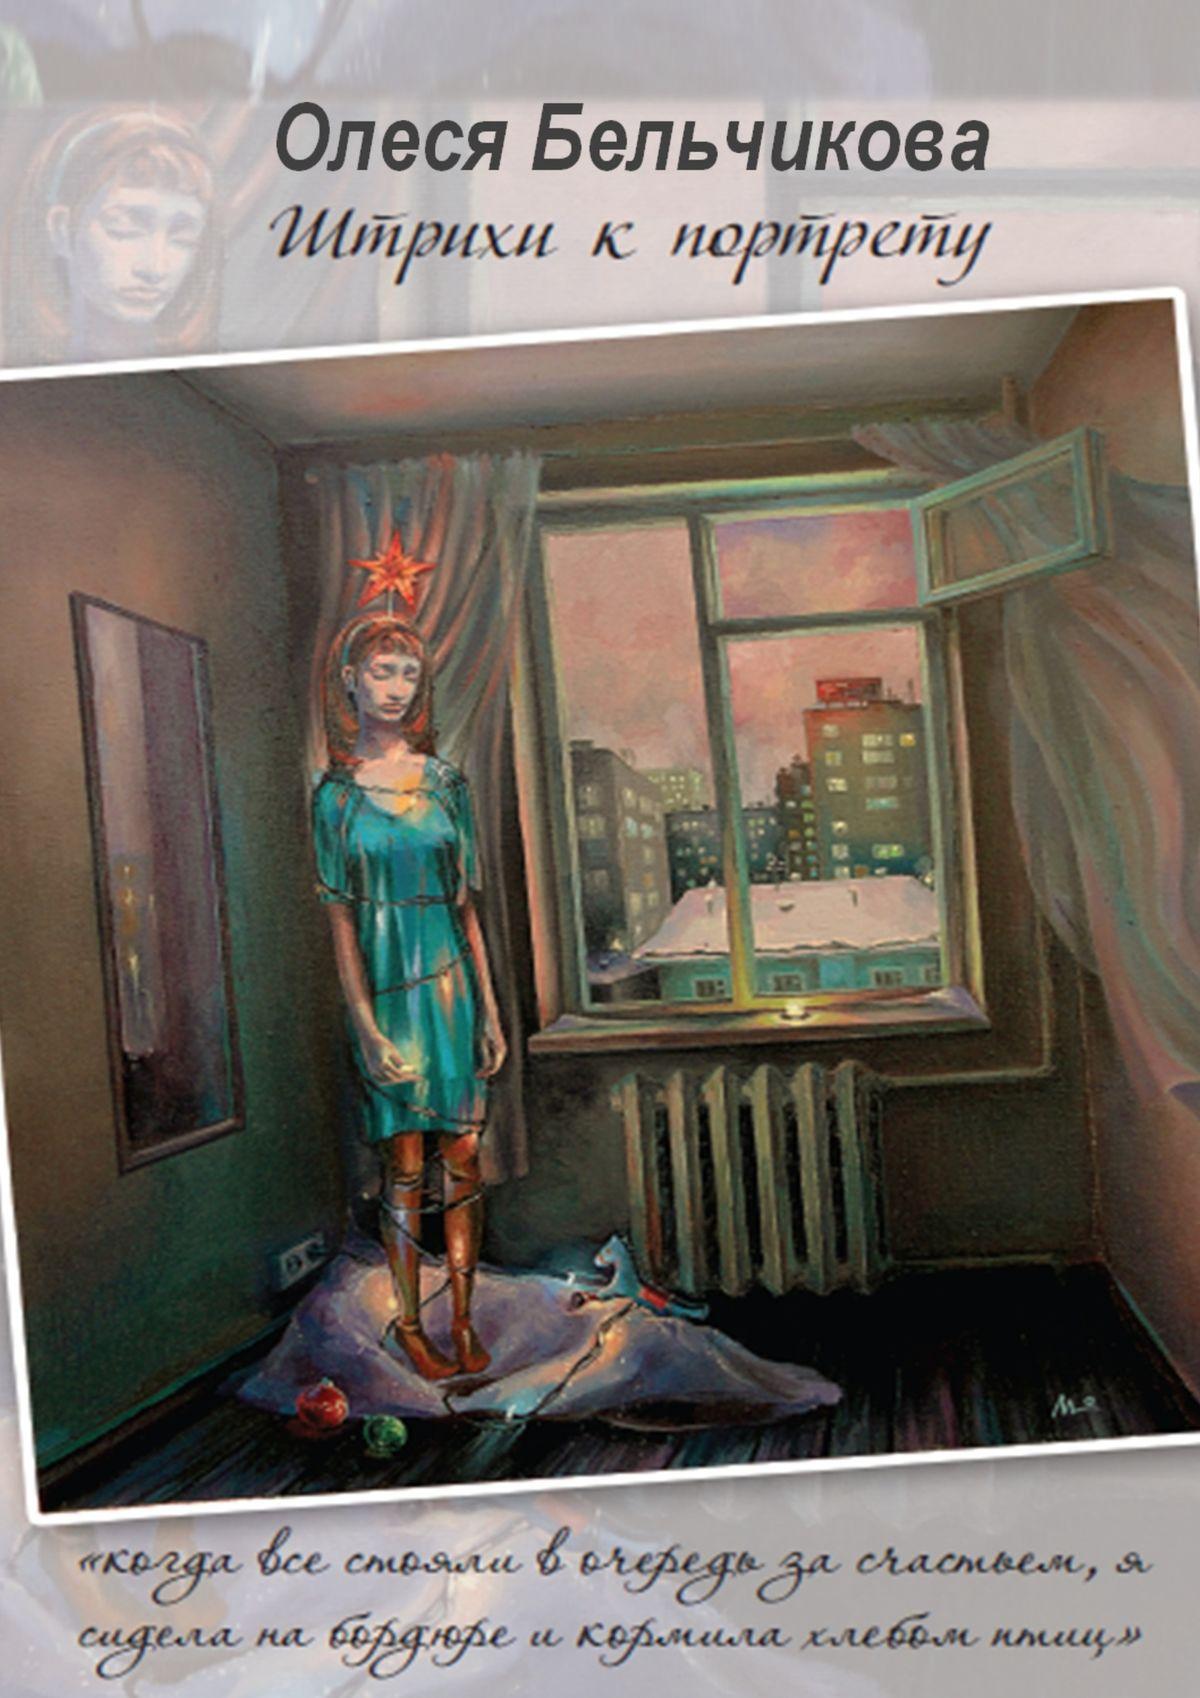 Олеся Бельчикова Штрихи к портрету александра борисовна киселёва истории – мои территории стихи